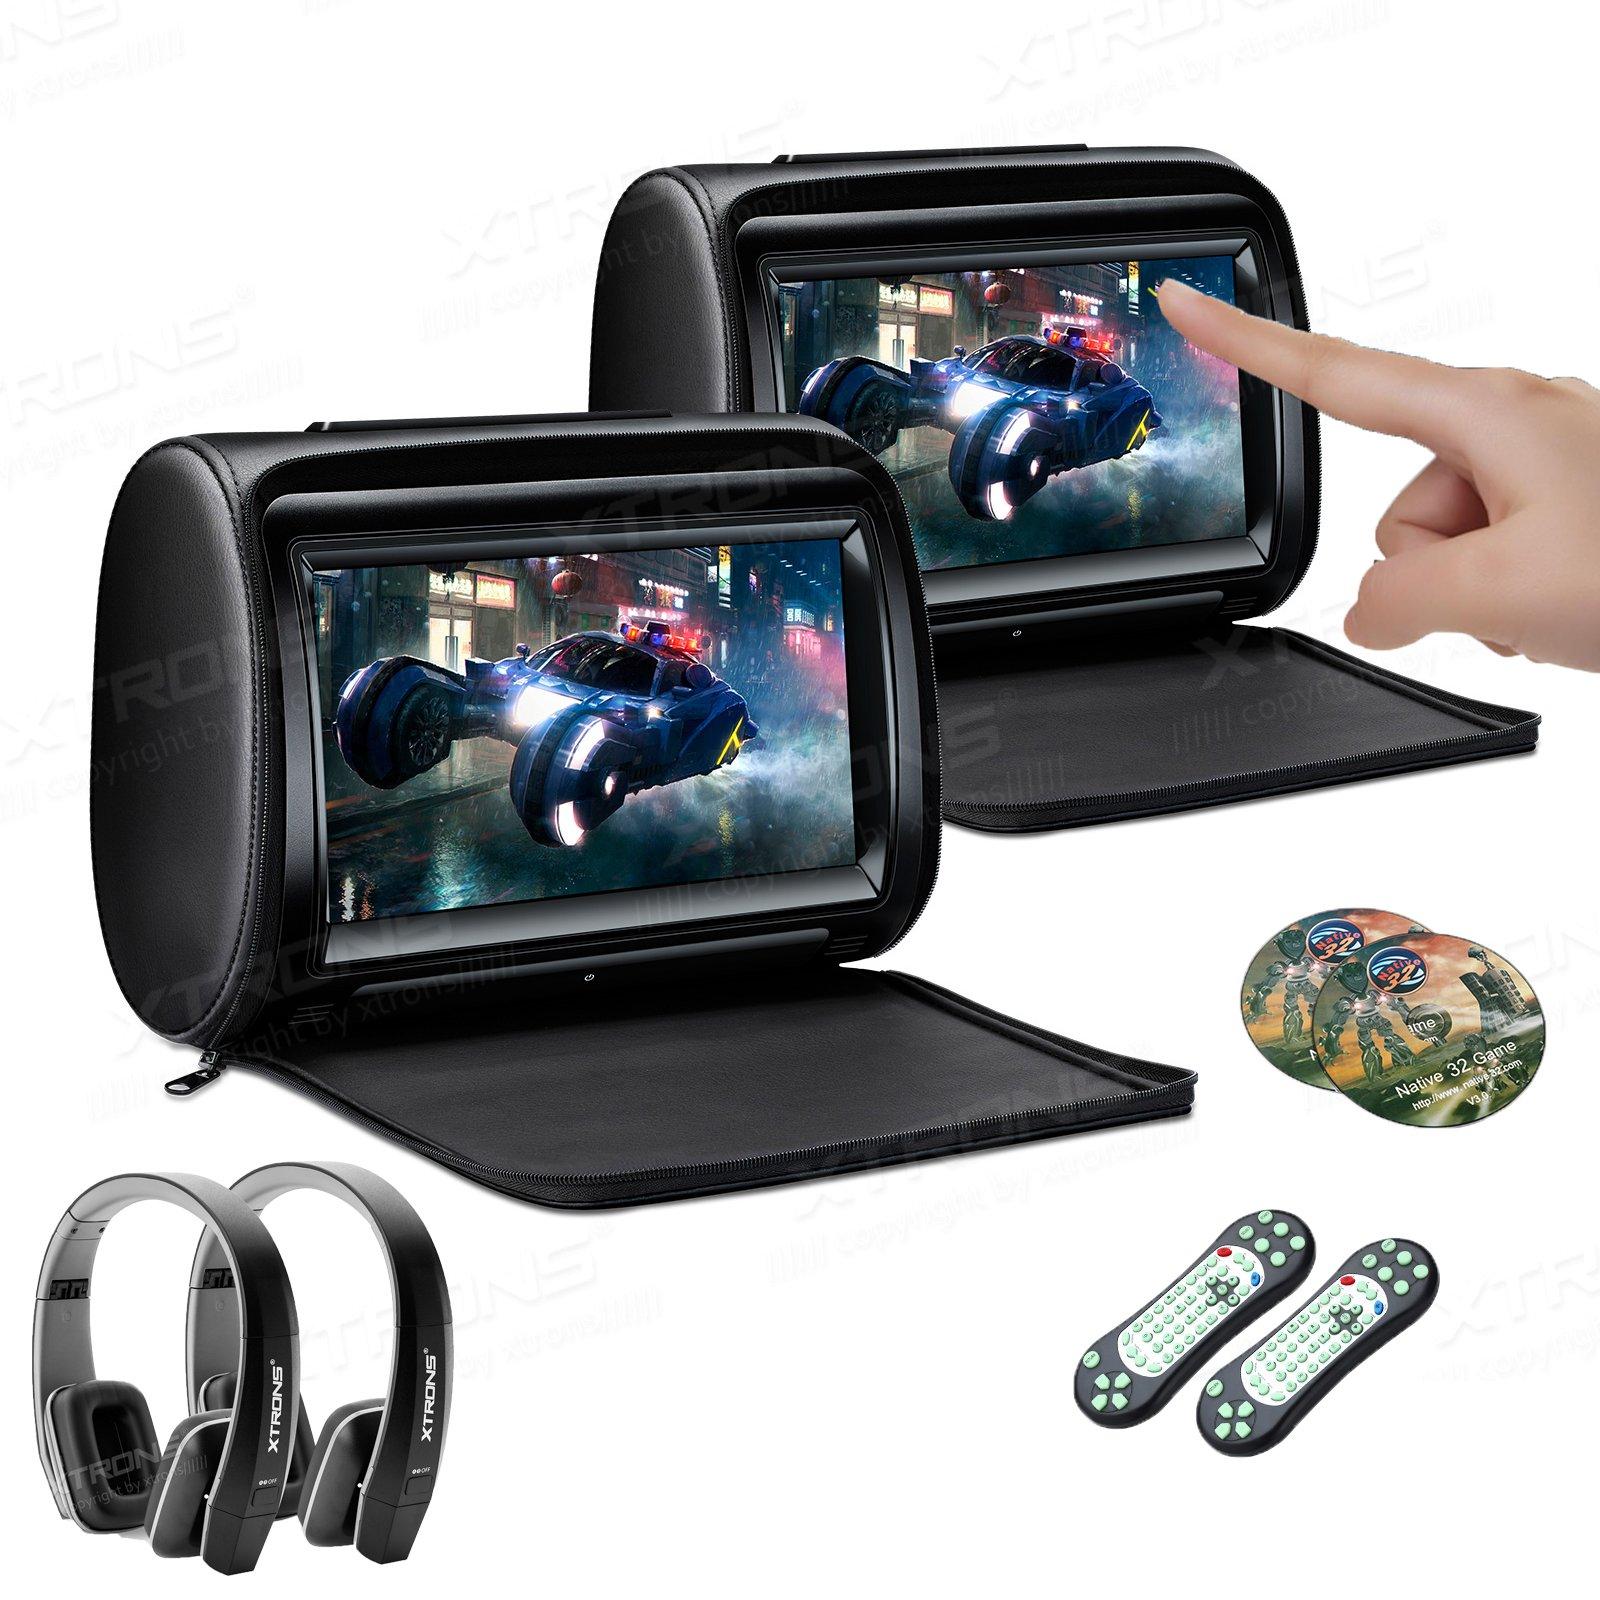 XTRONS 2 x 9 Inch Pair Car Headrest DVD Player HD Digital Adjustable Touch Screen 1080P Video Auto Games HDMI Version Black IR Headphones by XTRONS